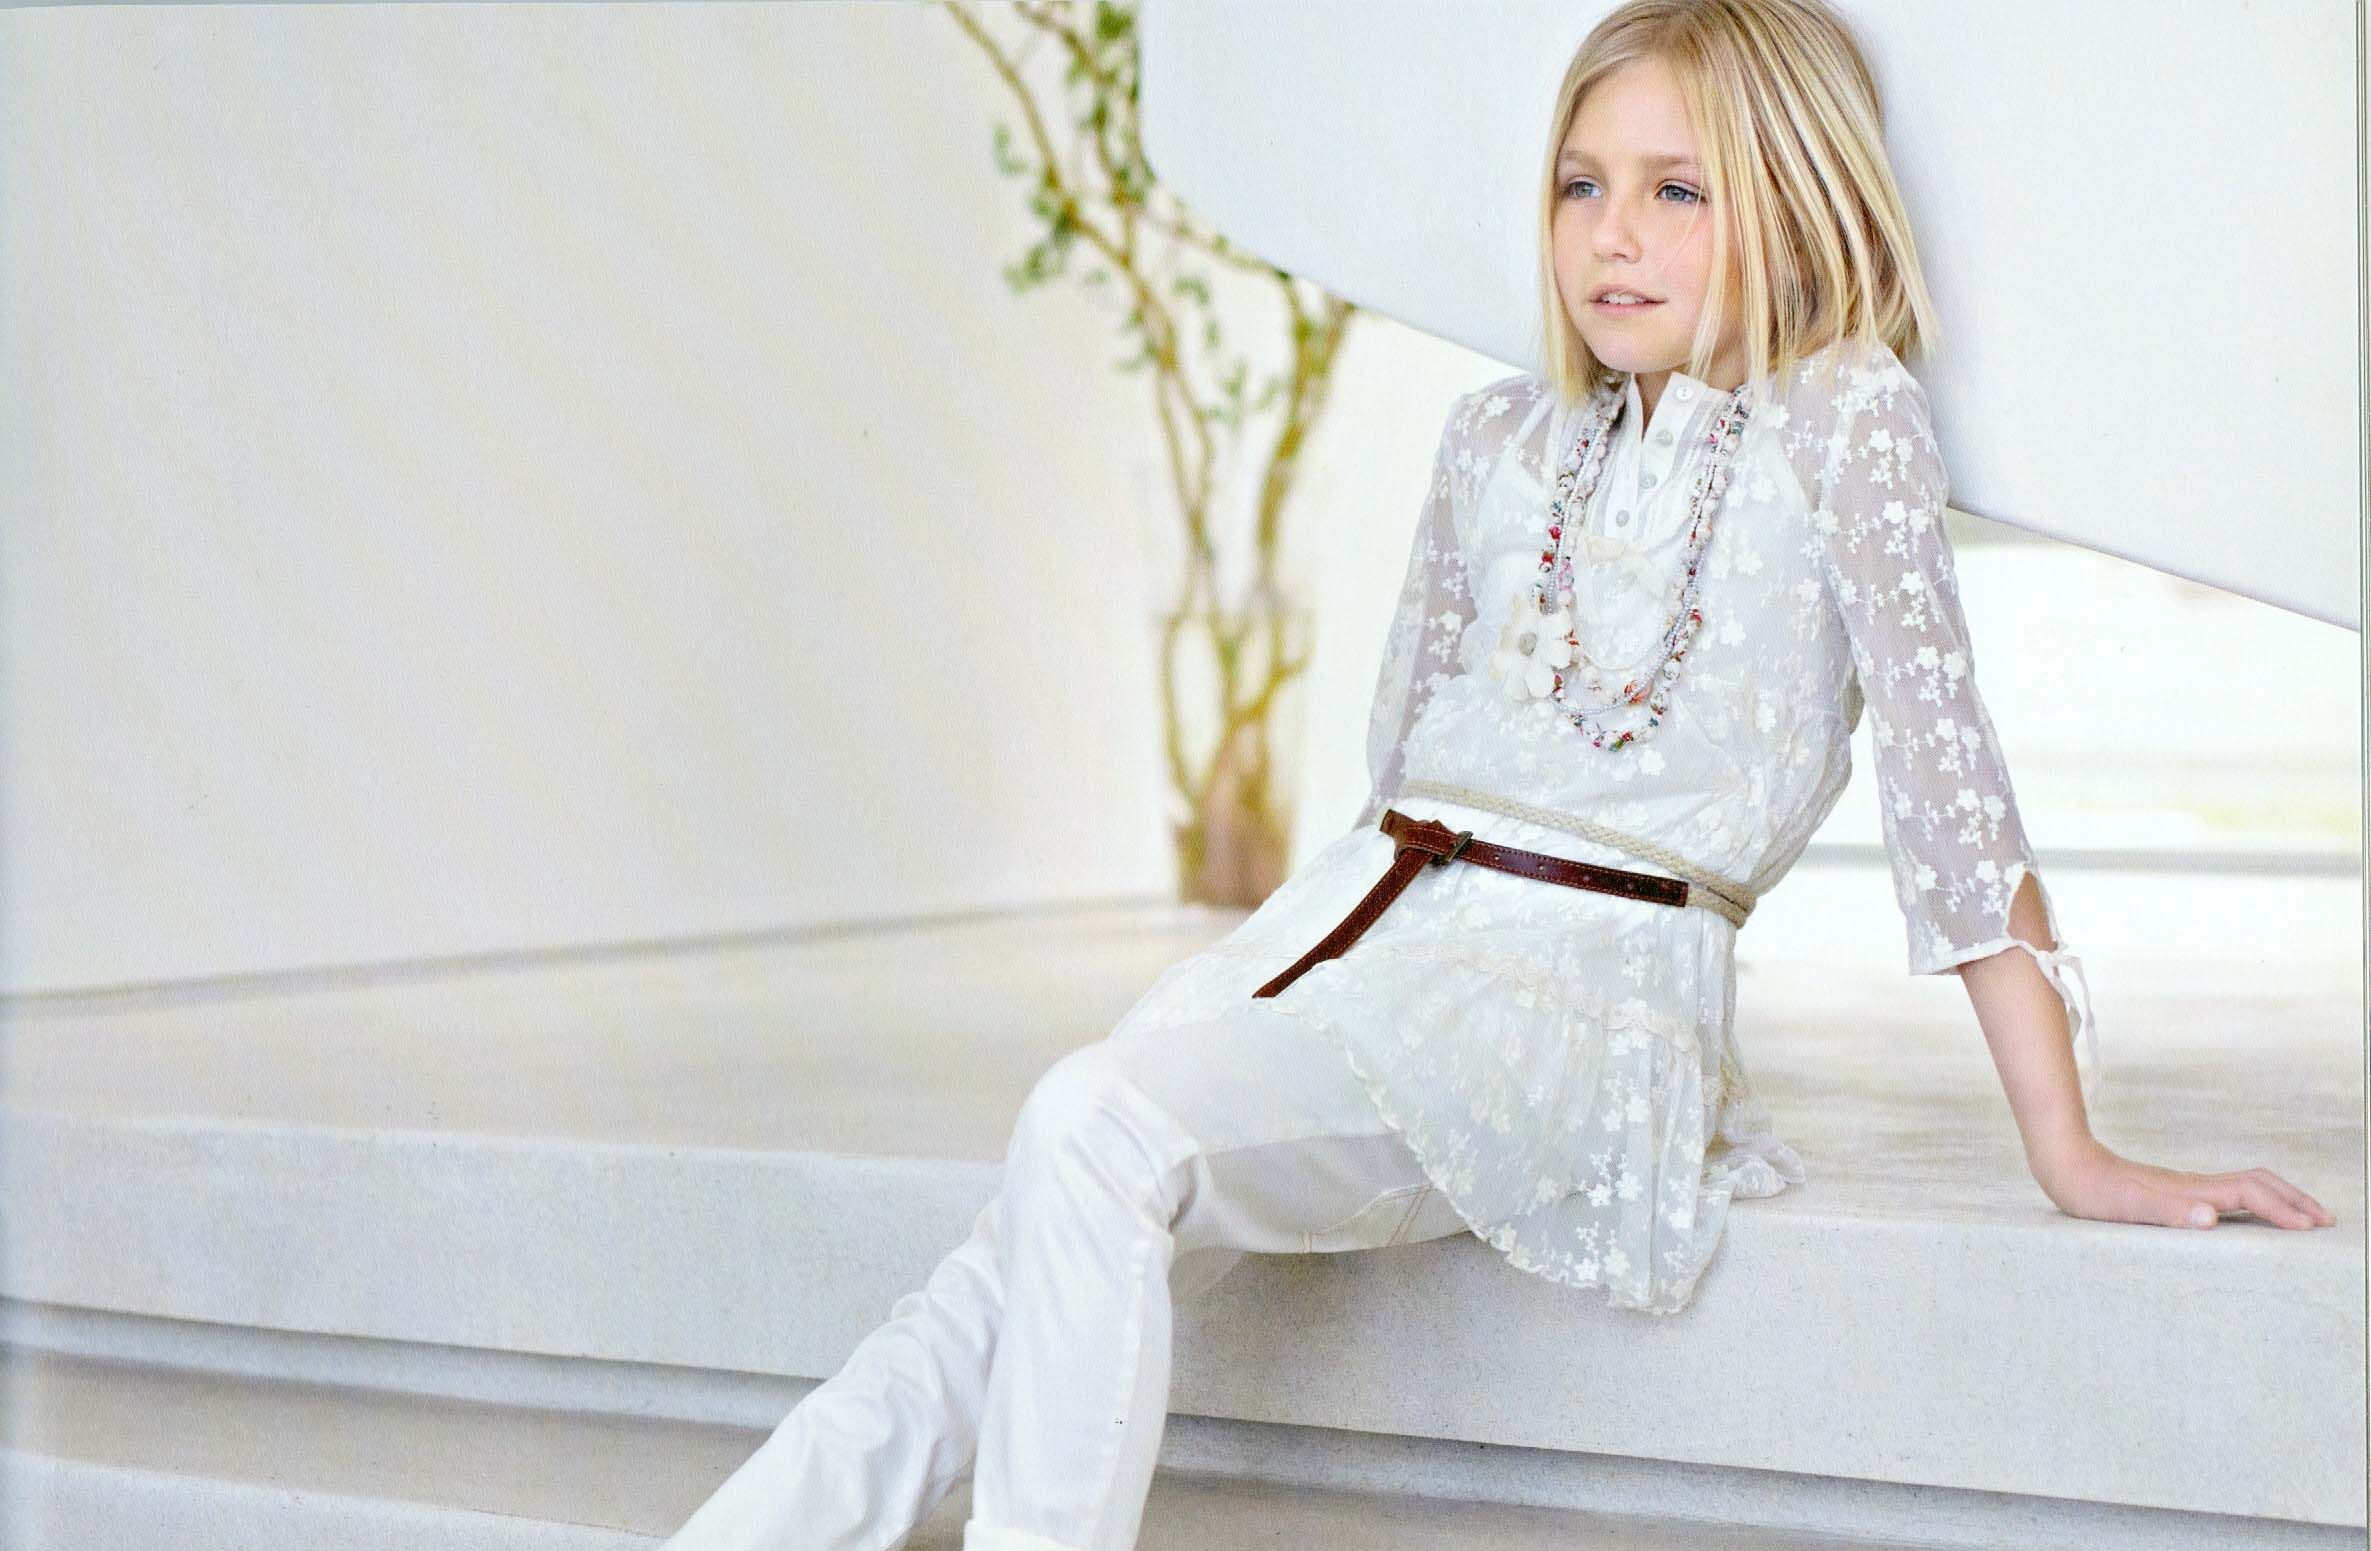 Vestiti Eleganti Junior.Elsy Junior Moda Bambina Abbigliamento Bimba Vestiti Bambina